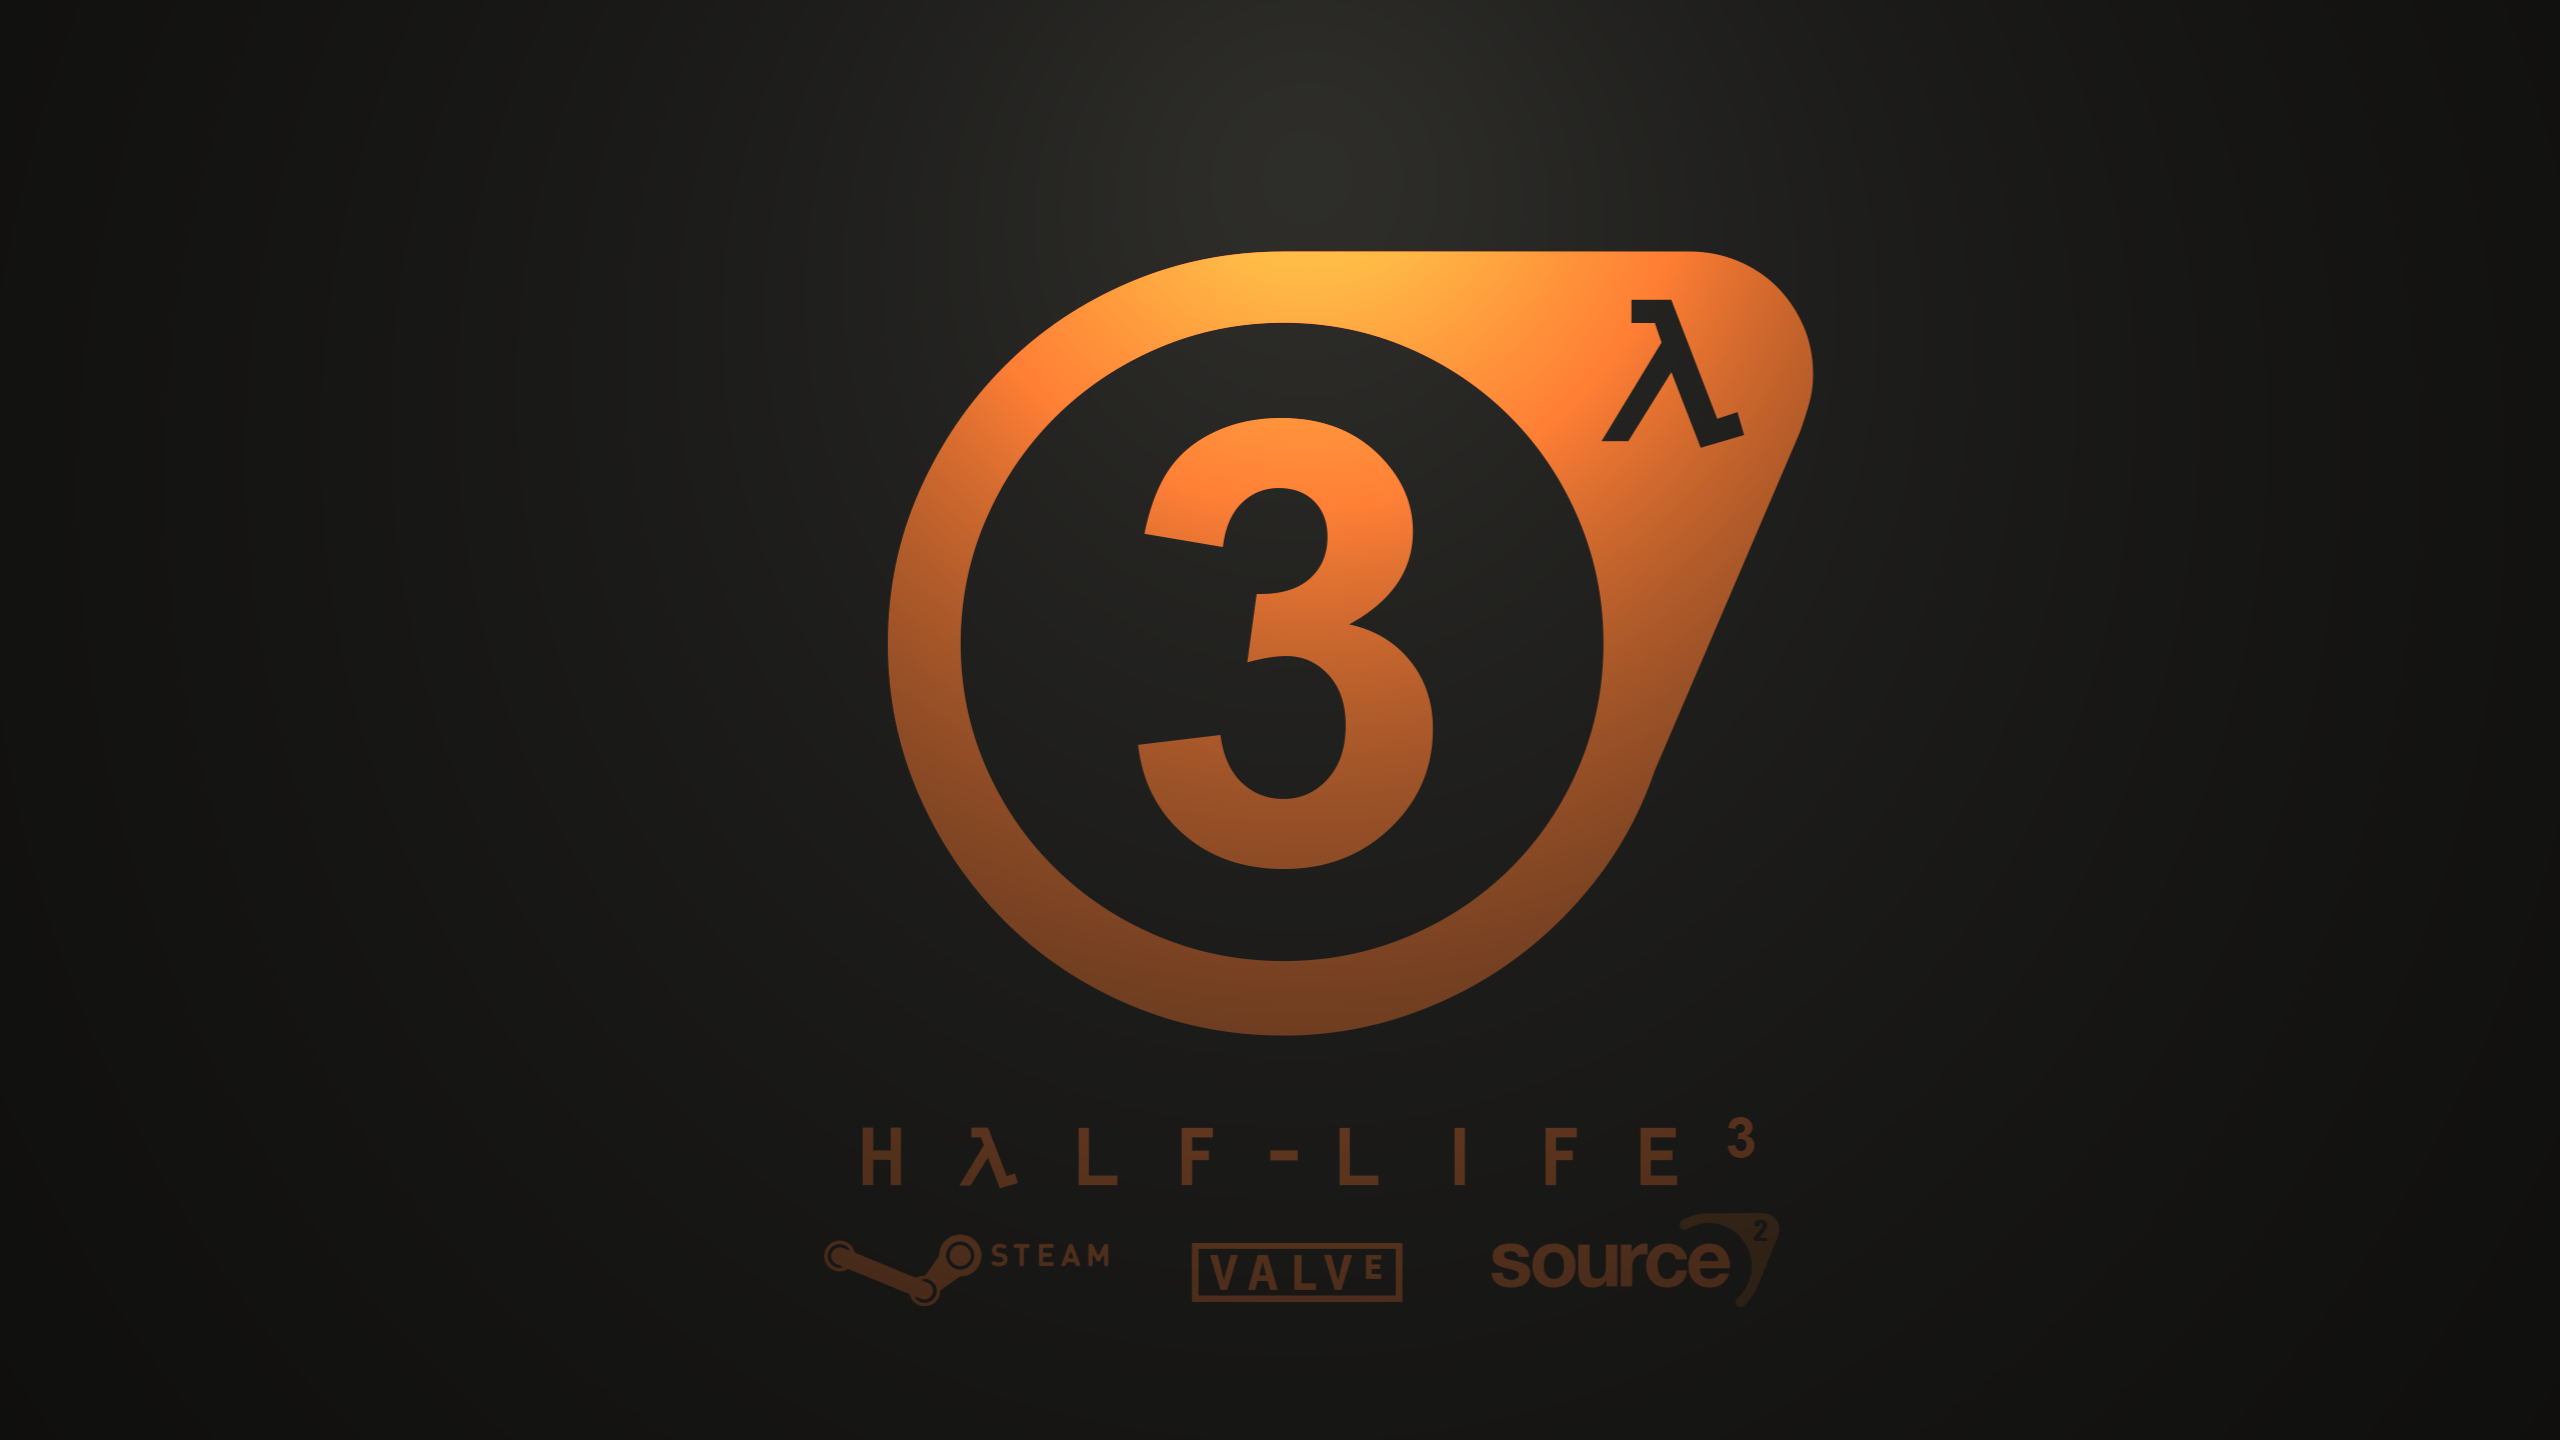 Half-Life 3 Pics, Video Game Collection